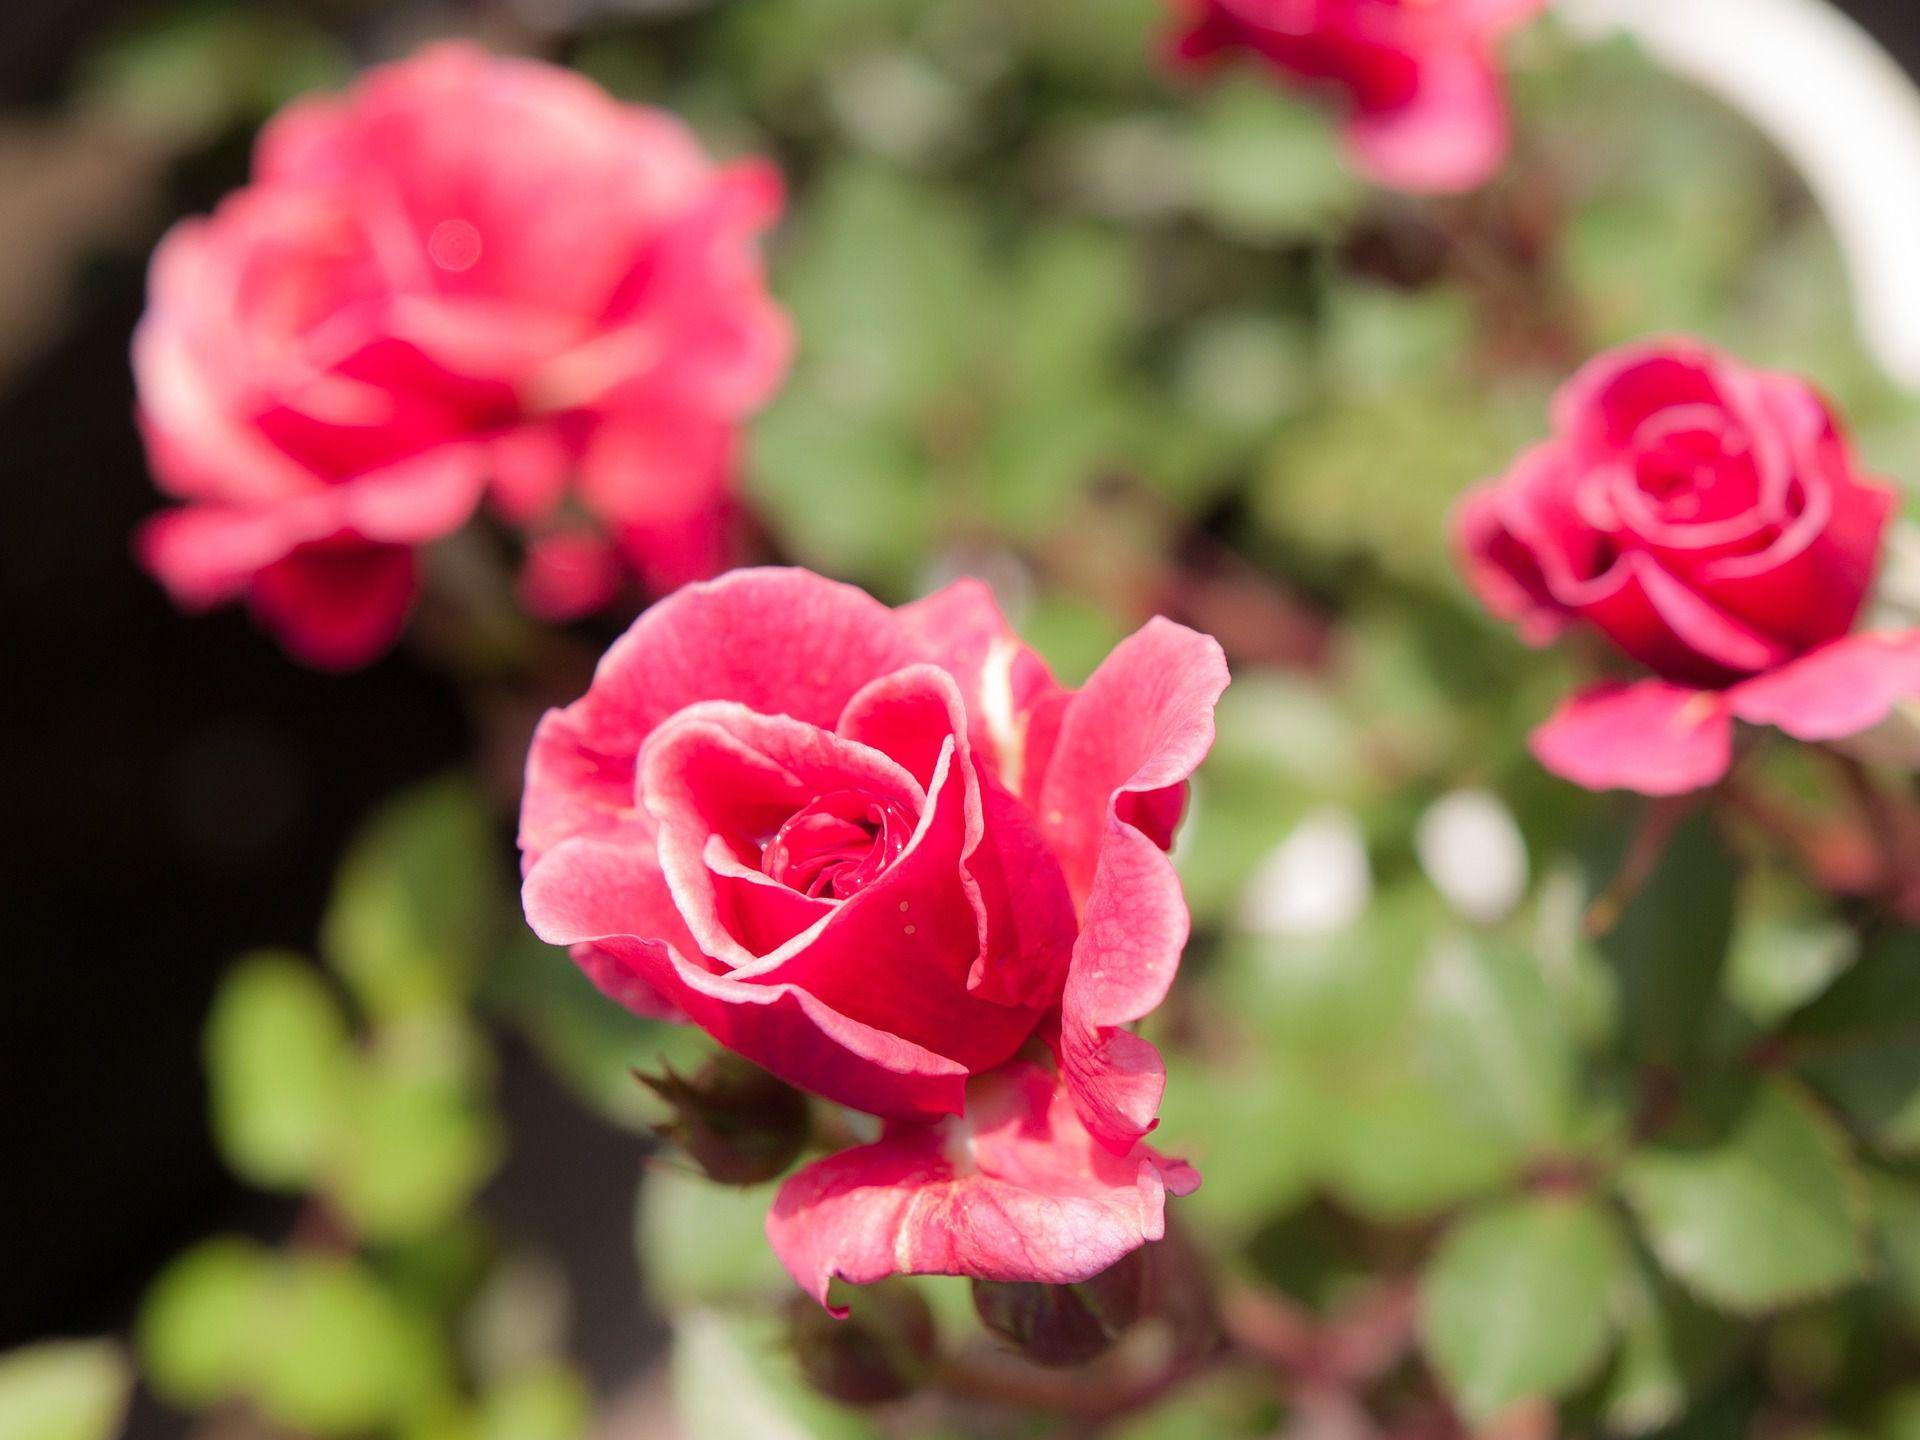 Kordana Miniature Rose Care And Growing Instructions